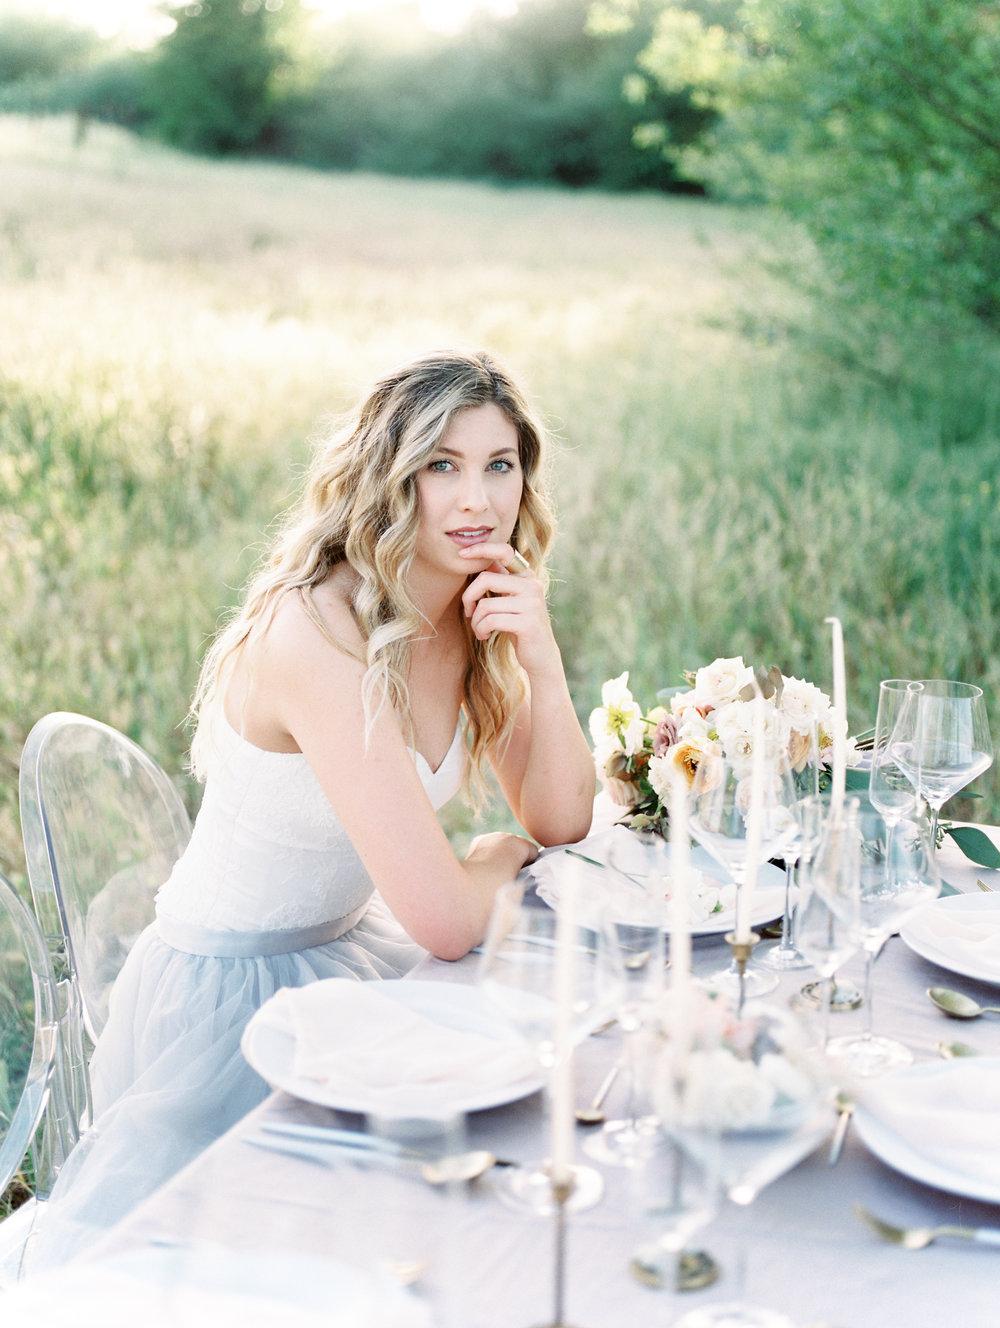 Spring wedding outdoor photoshoot and wedding idea